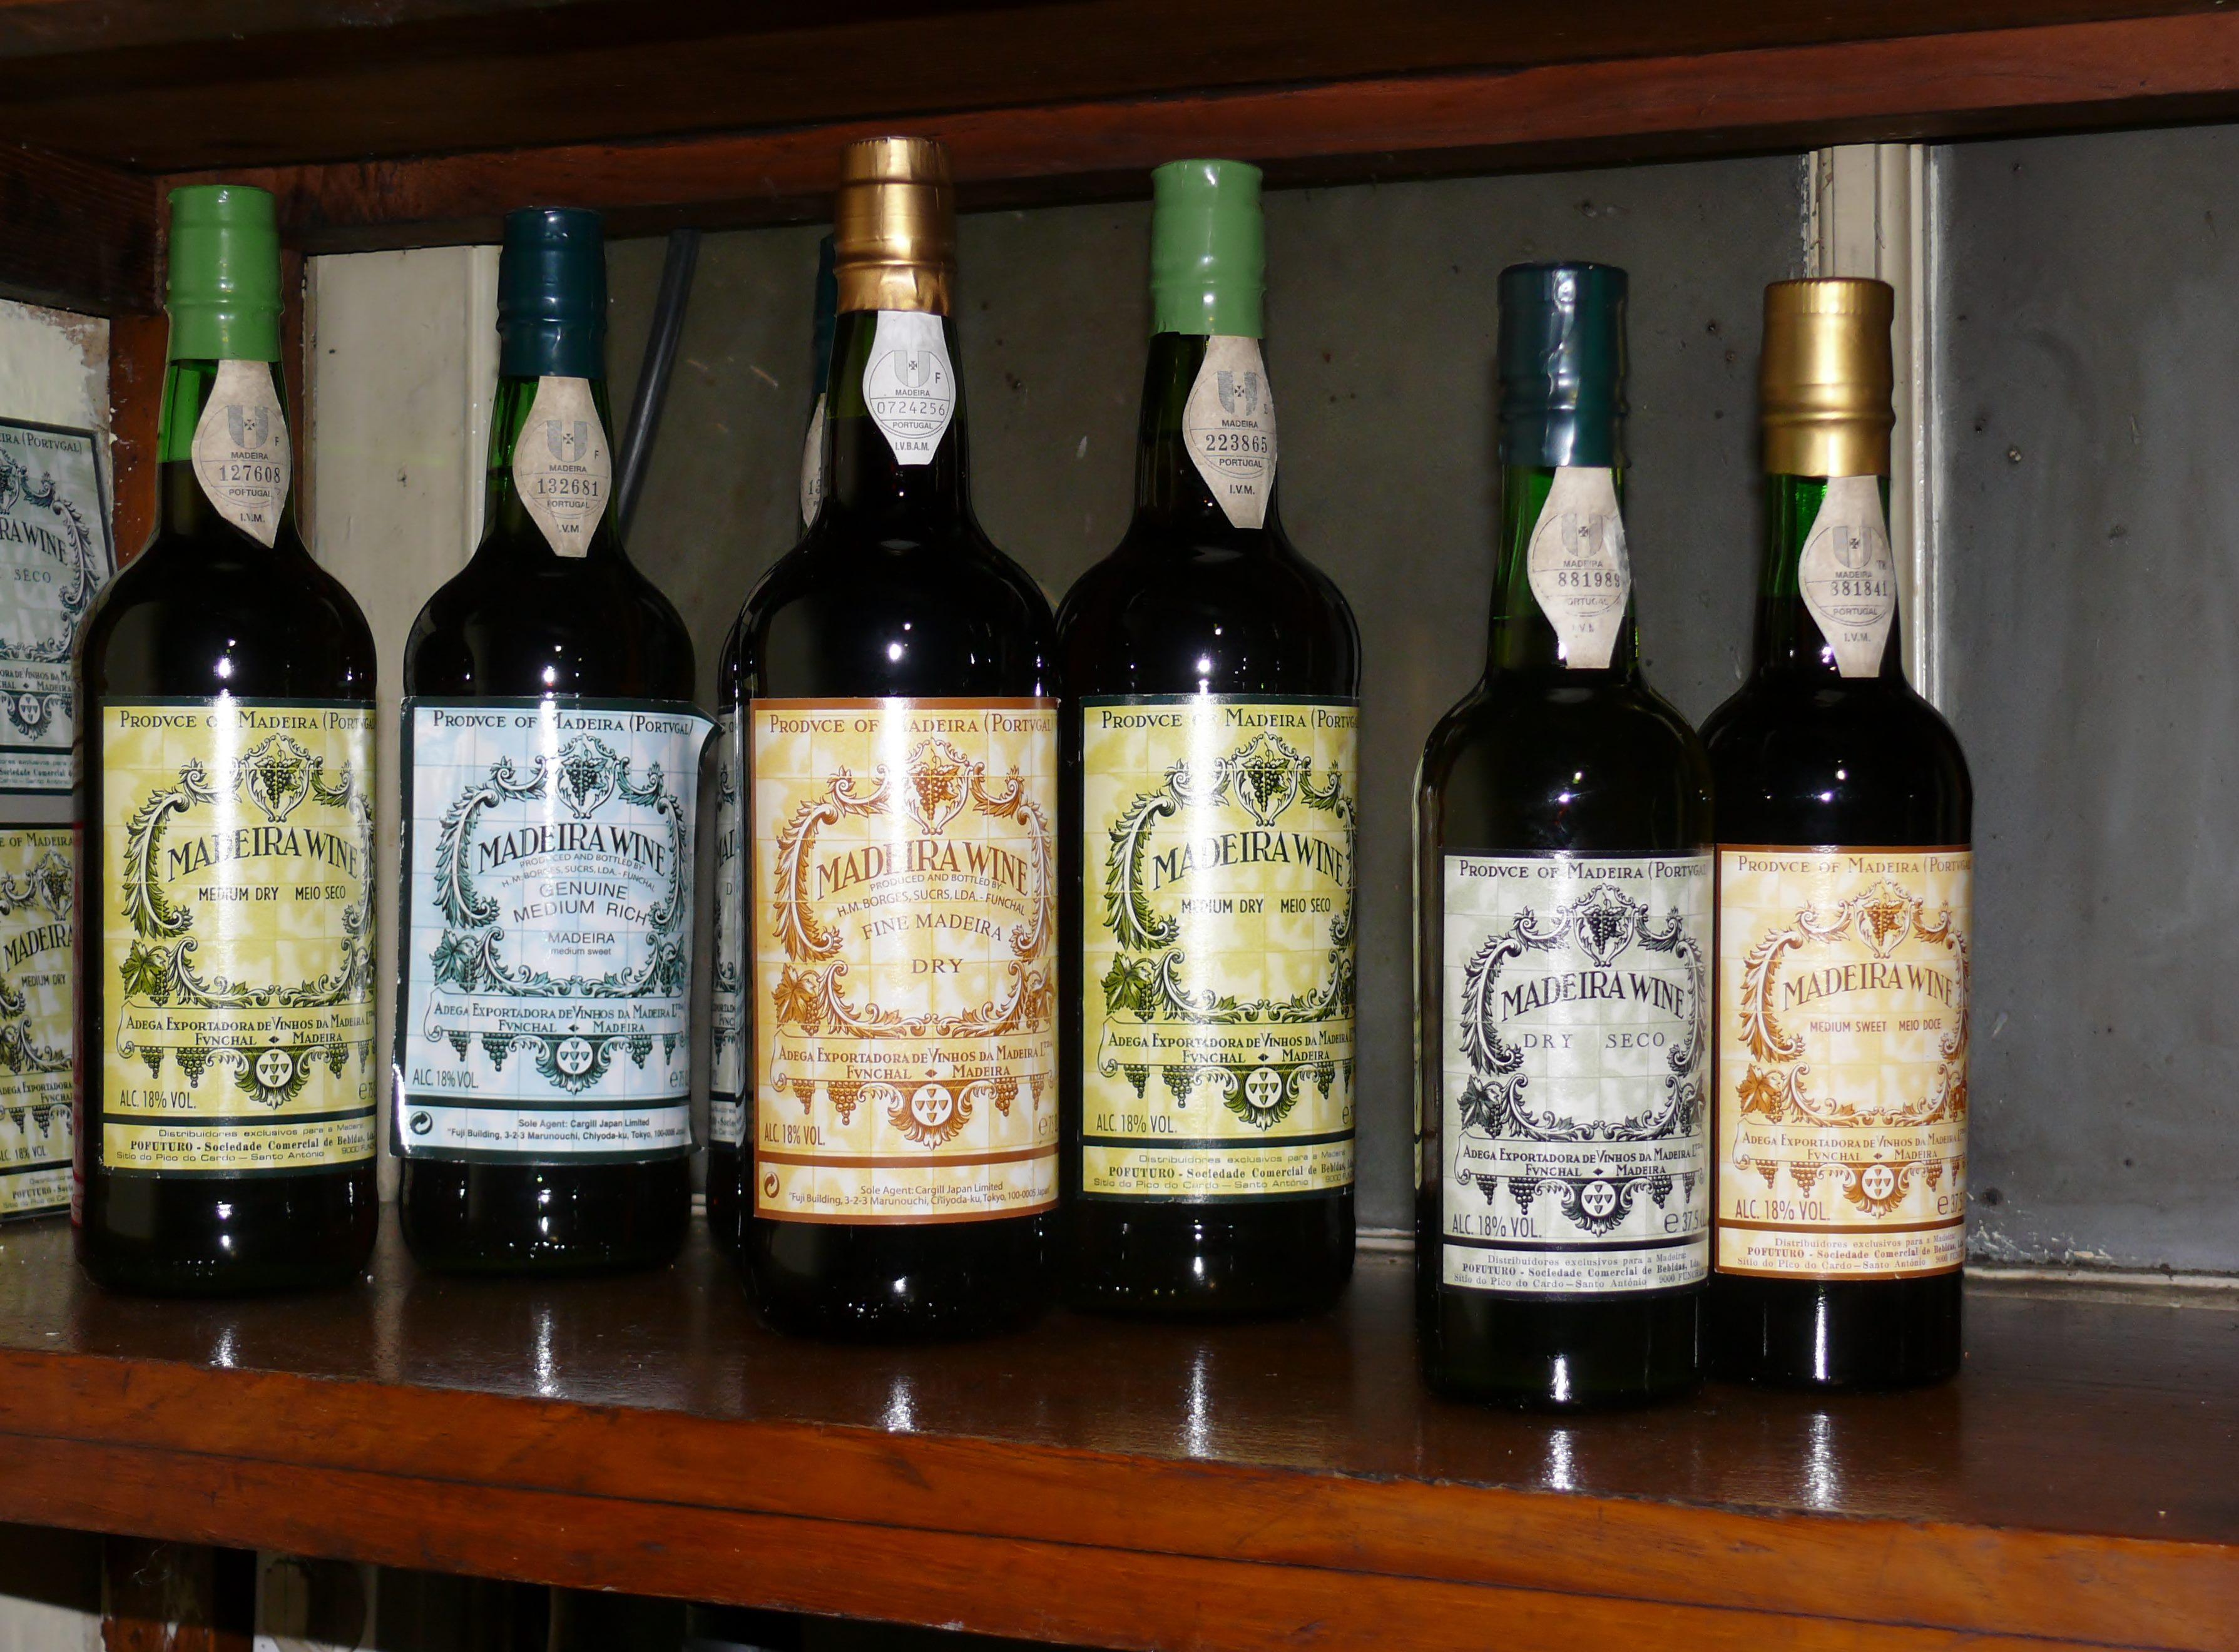 Borges tile style bottles